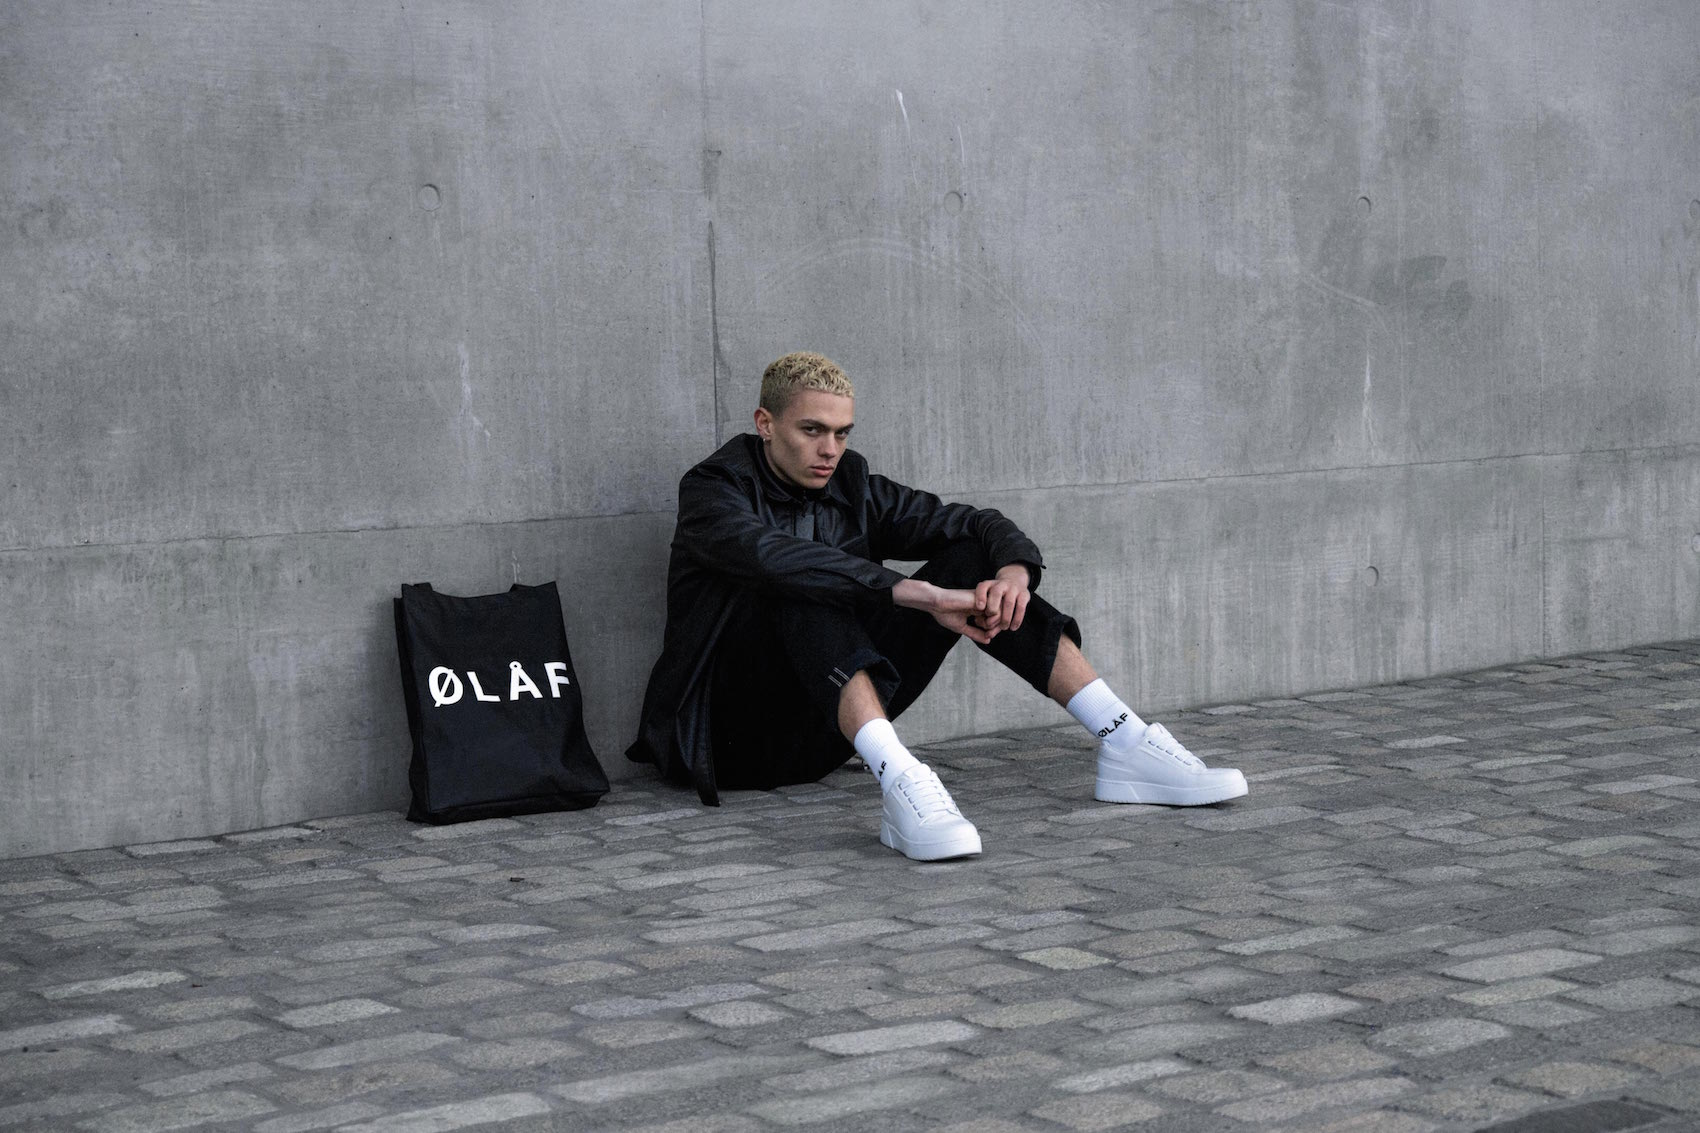 Olaf Hussein Black Jacket and Tote Bag and White SOcks